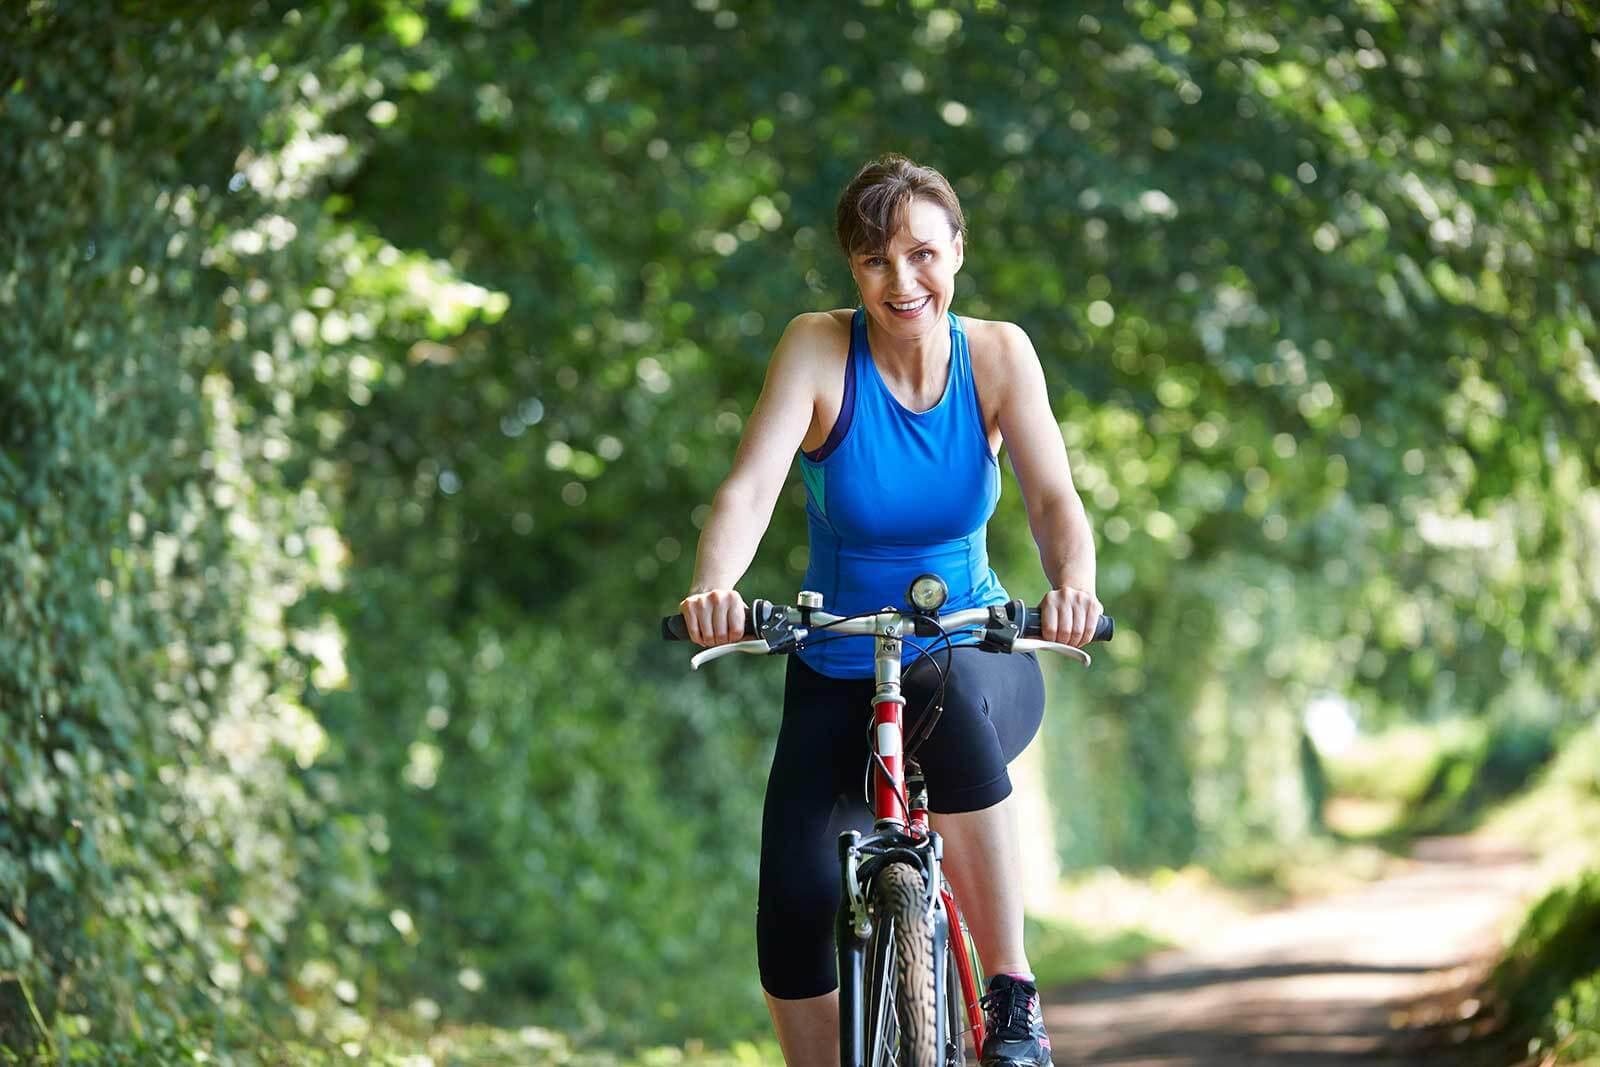 biker-woman3